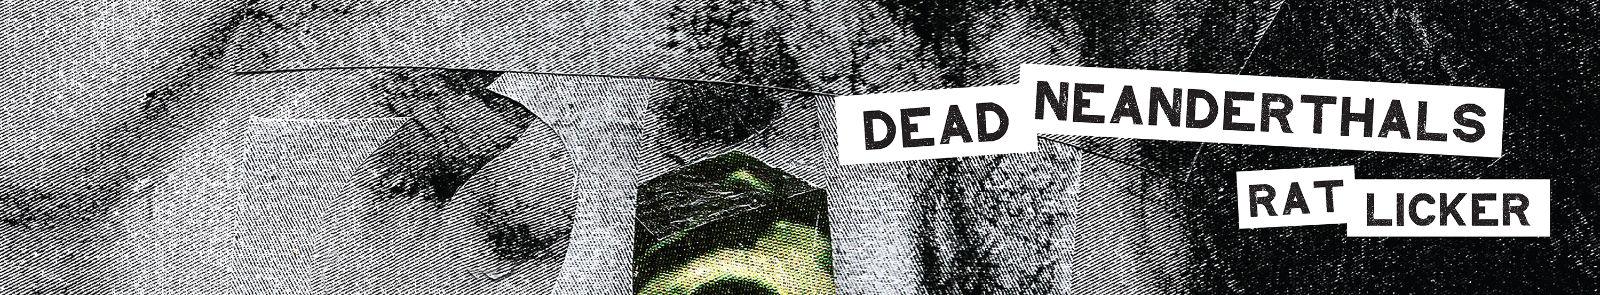 MFRS002 Dead Neanderthals - Rat Licker codes_websitebanner